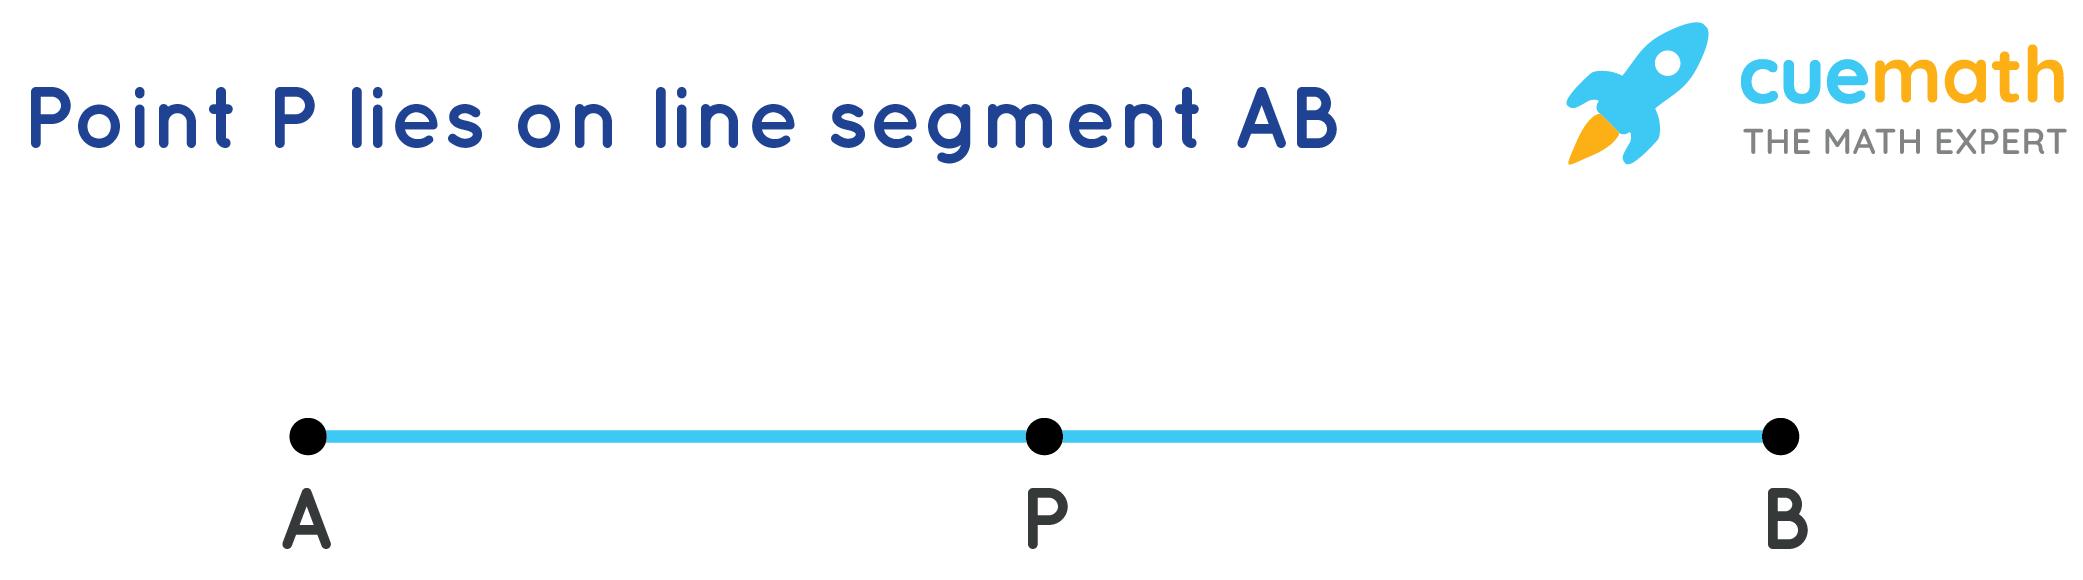 Point P lies on line segment AB